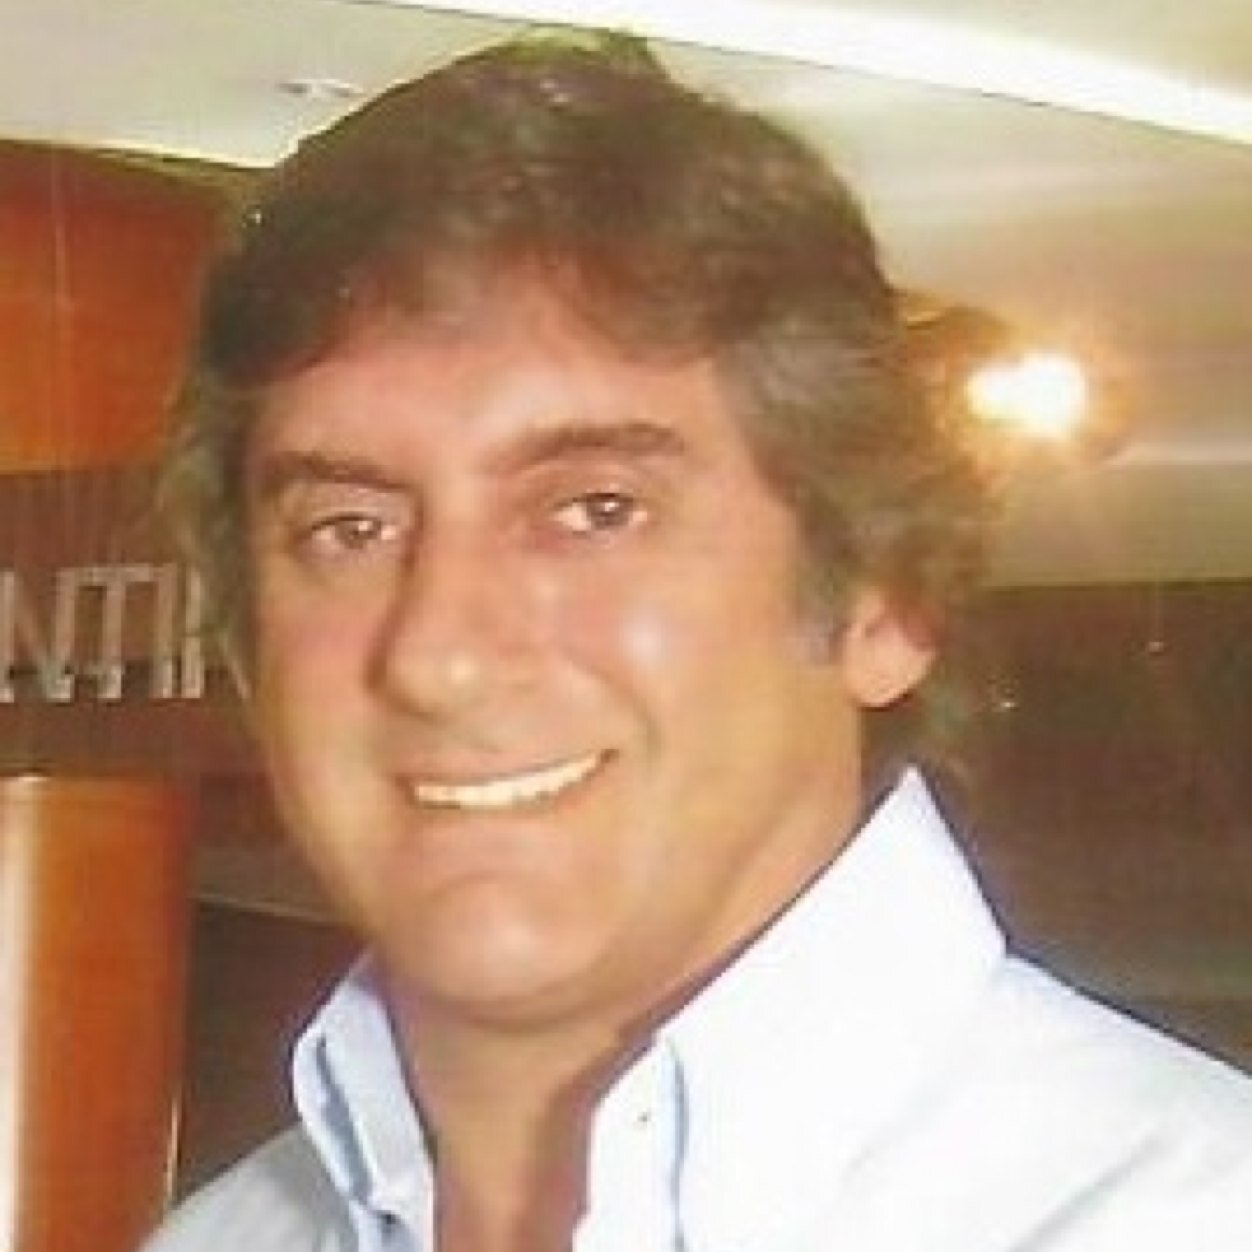 Enzo Francescoli Francescolli9